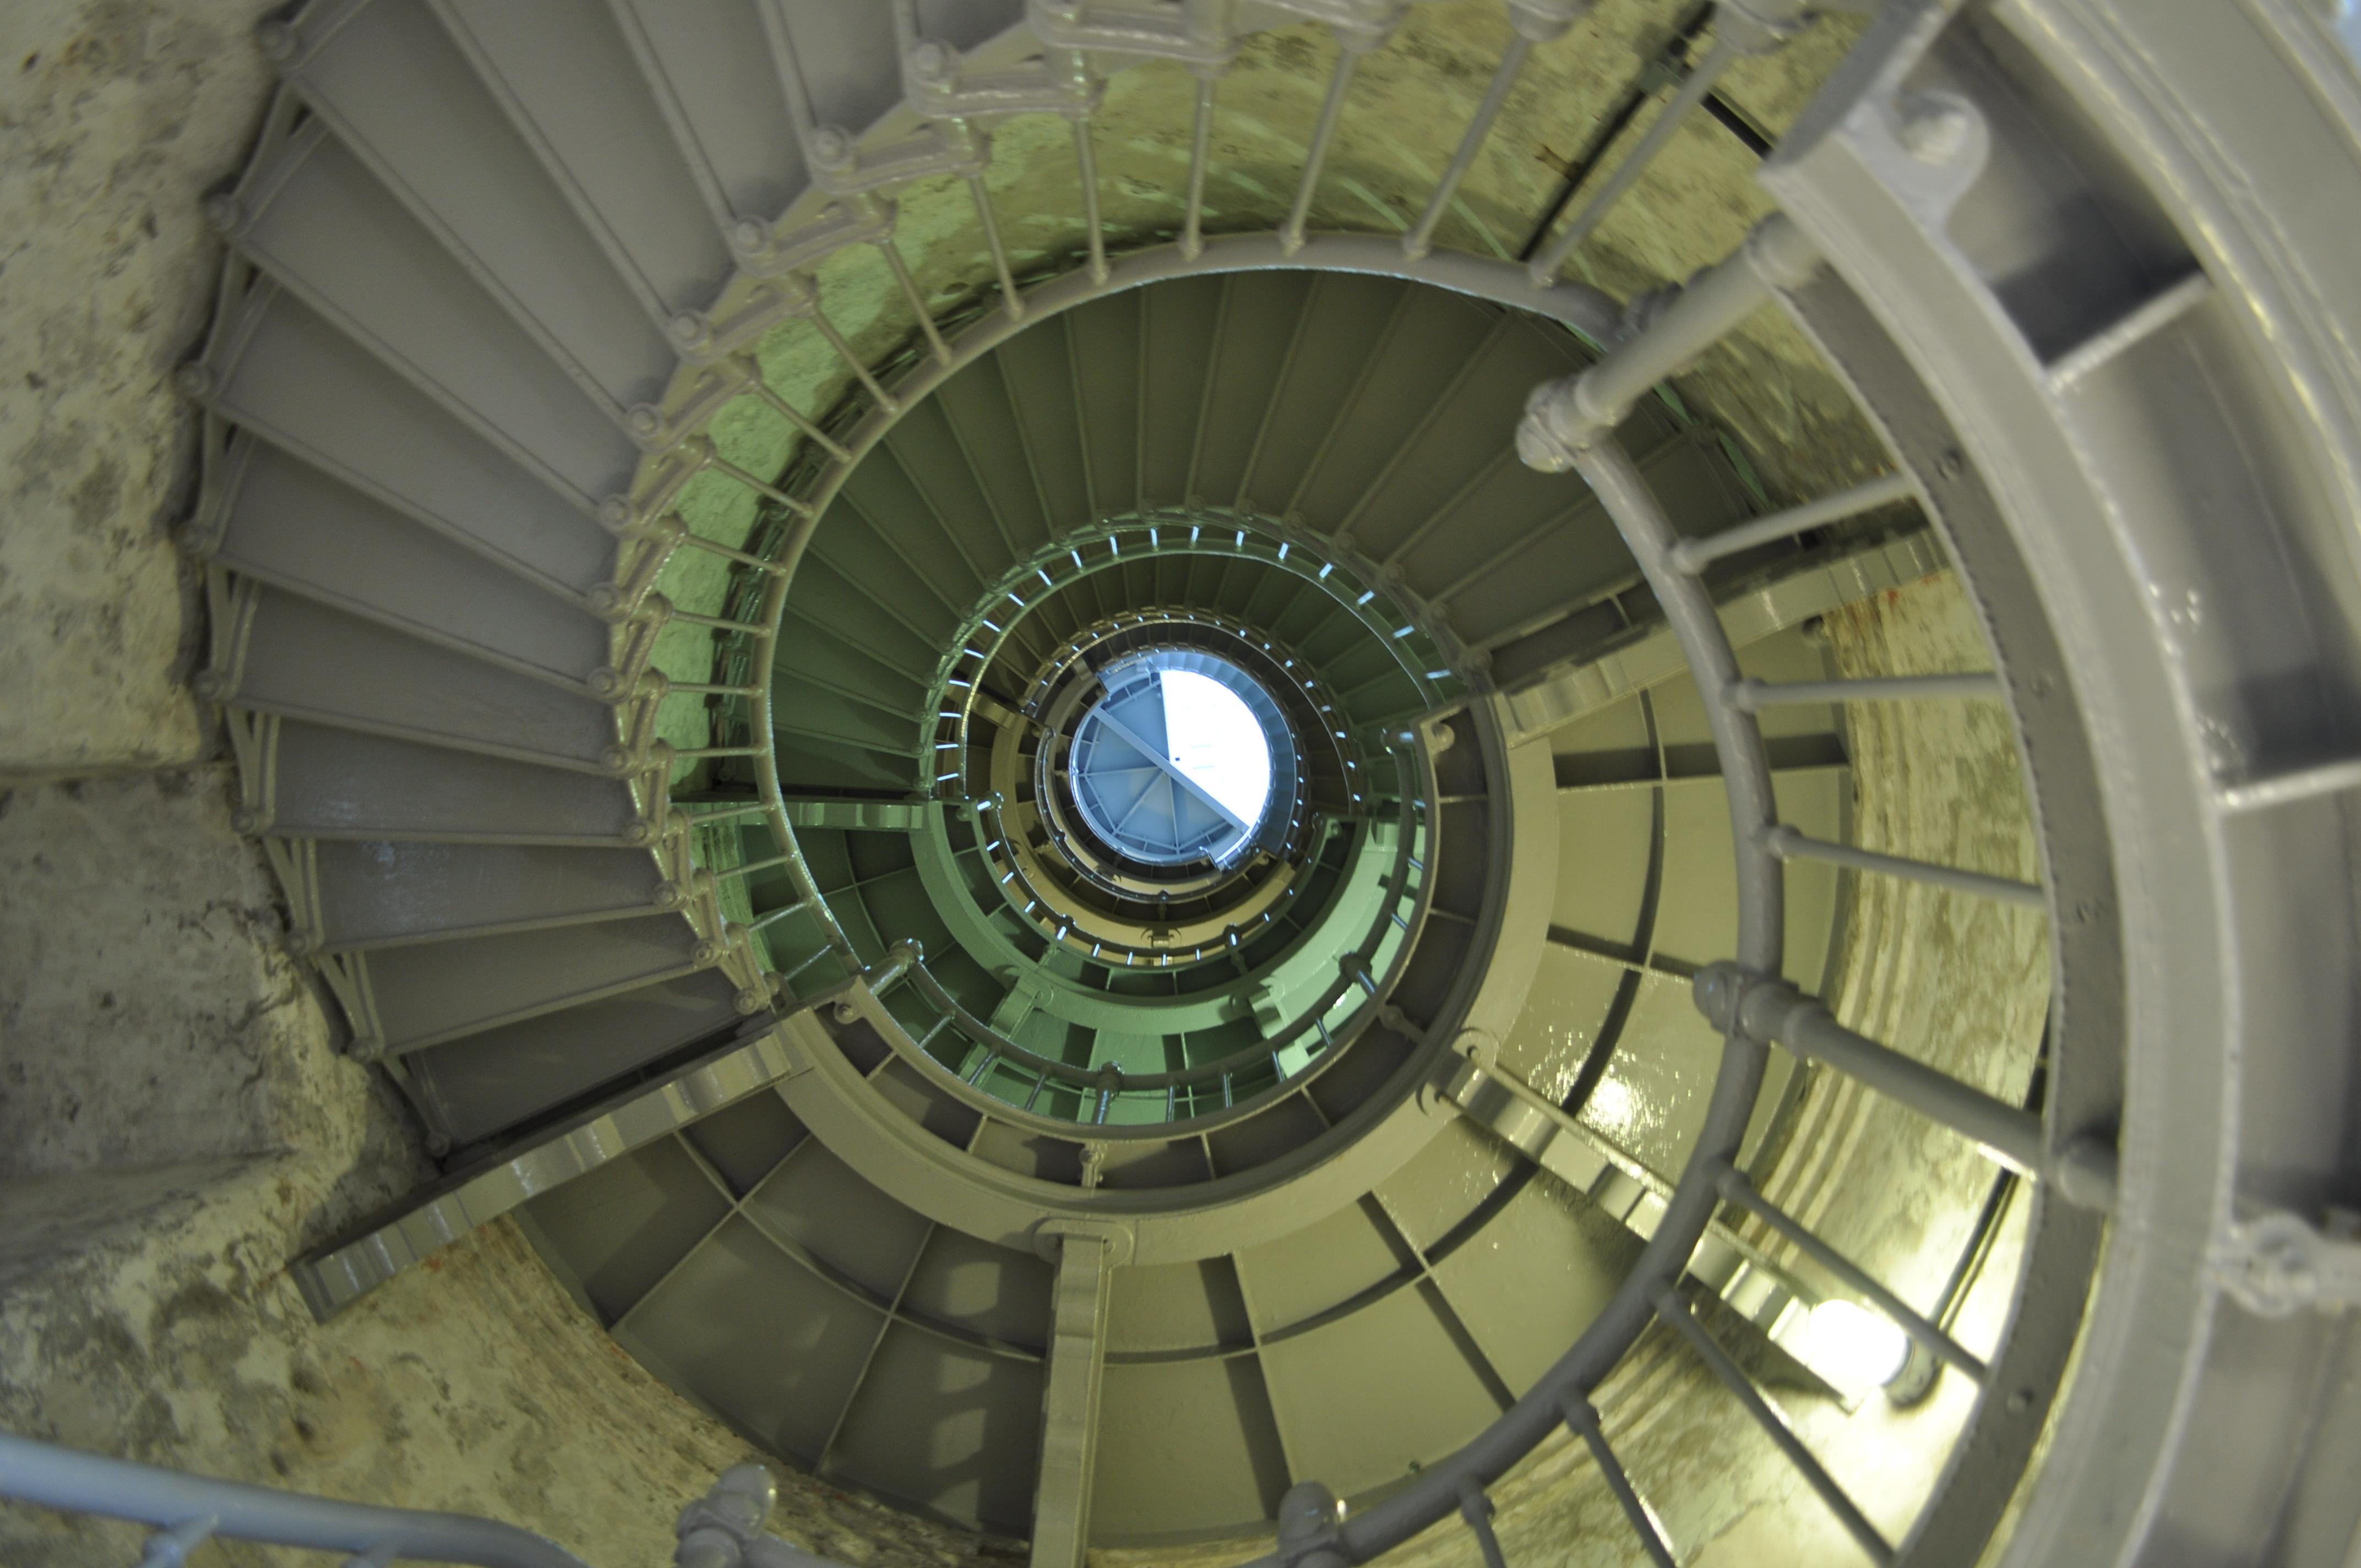 Beautiful File:Grays Harbor (Westport) Lighthouse Interior 01